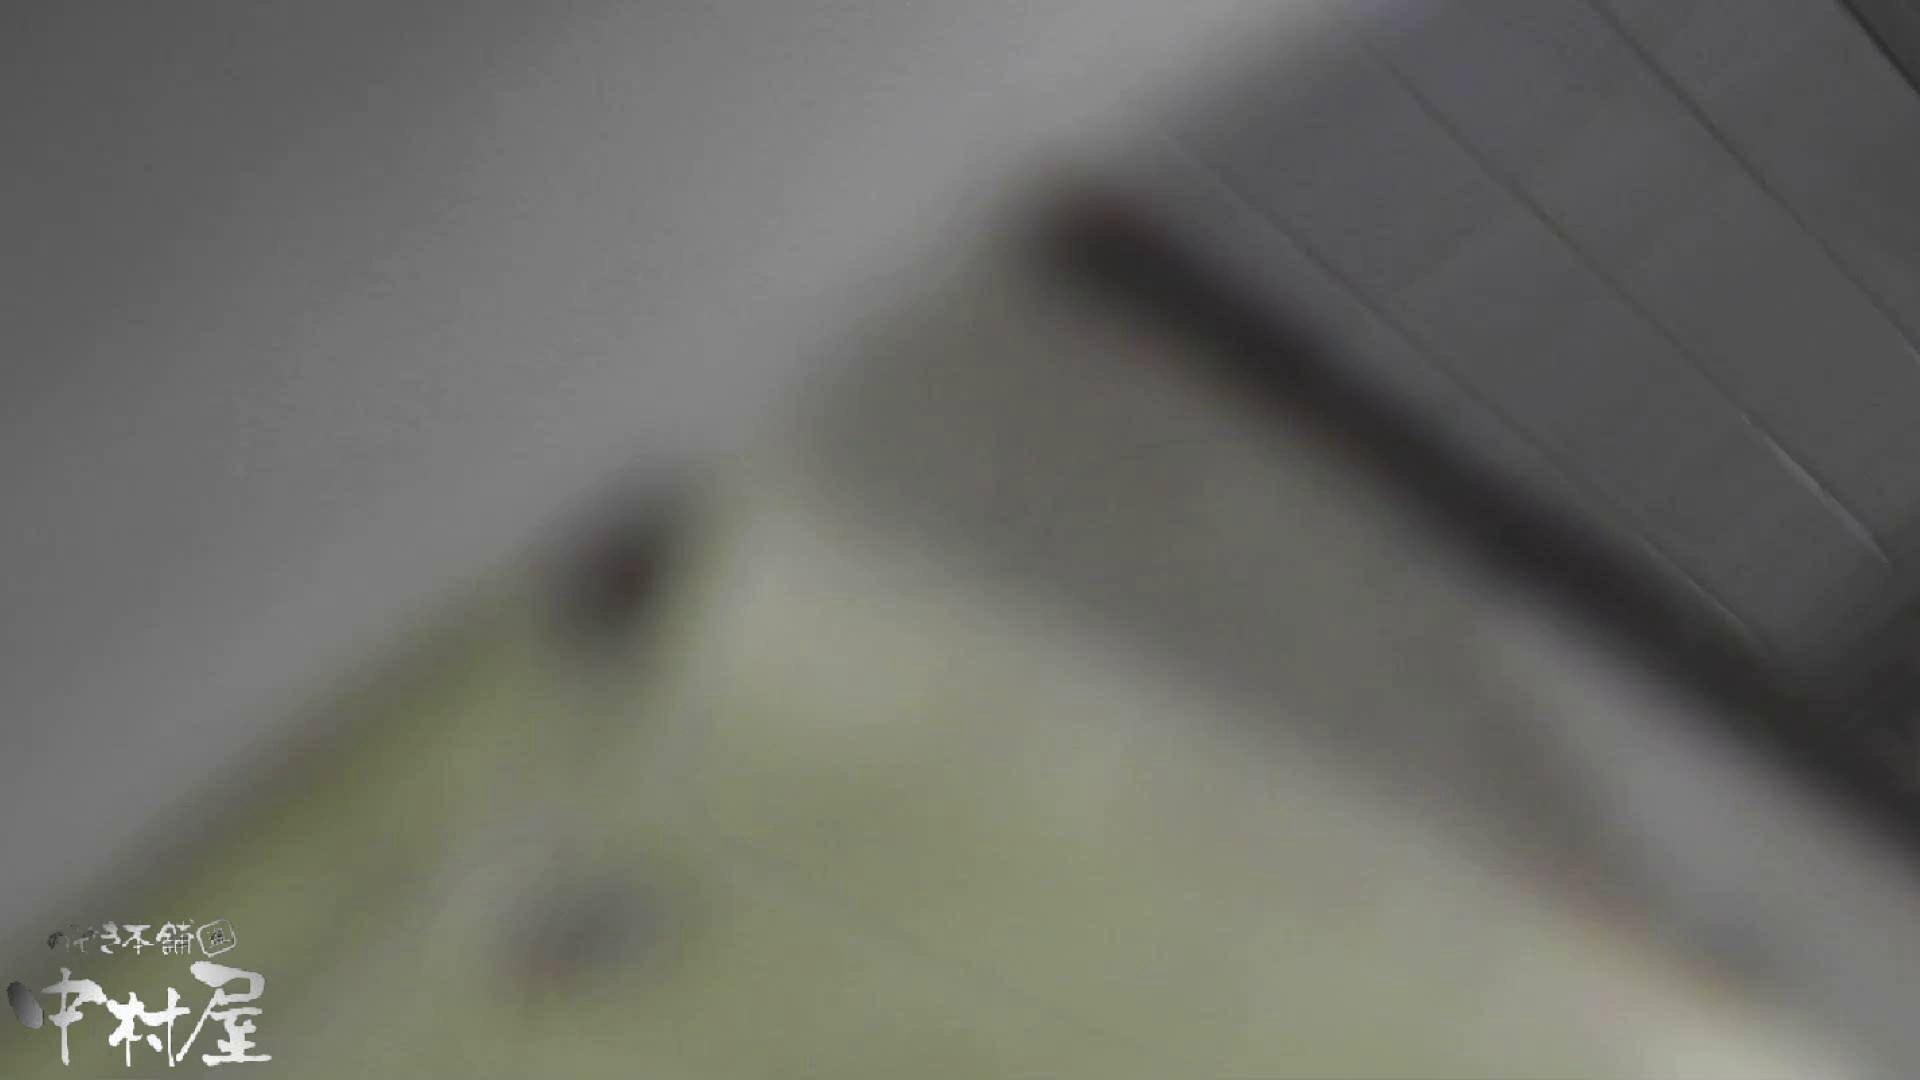 vol.12 命がけ潜伏洗面所! ツイてるね♥ 洗面所 ぱこり動画紹介 96連発 68